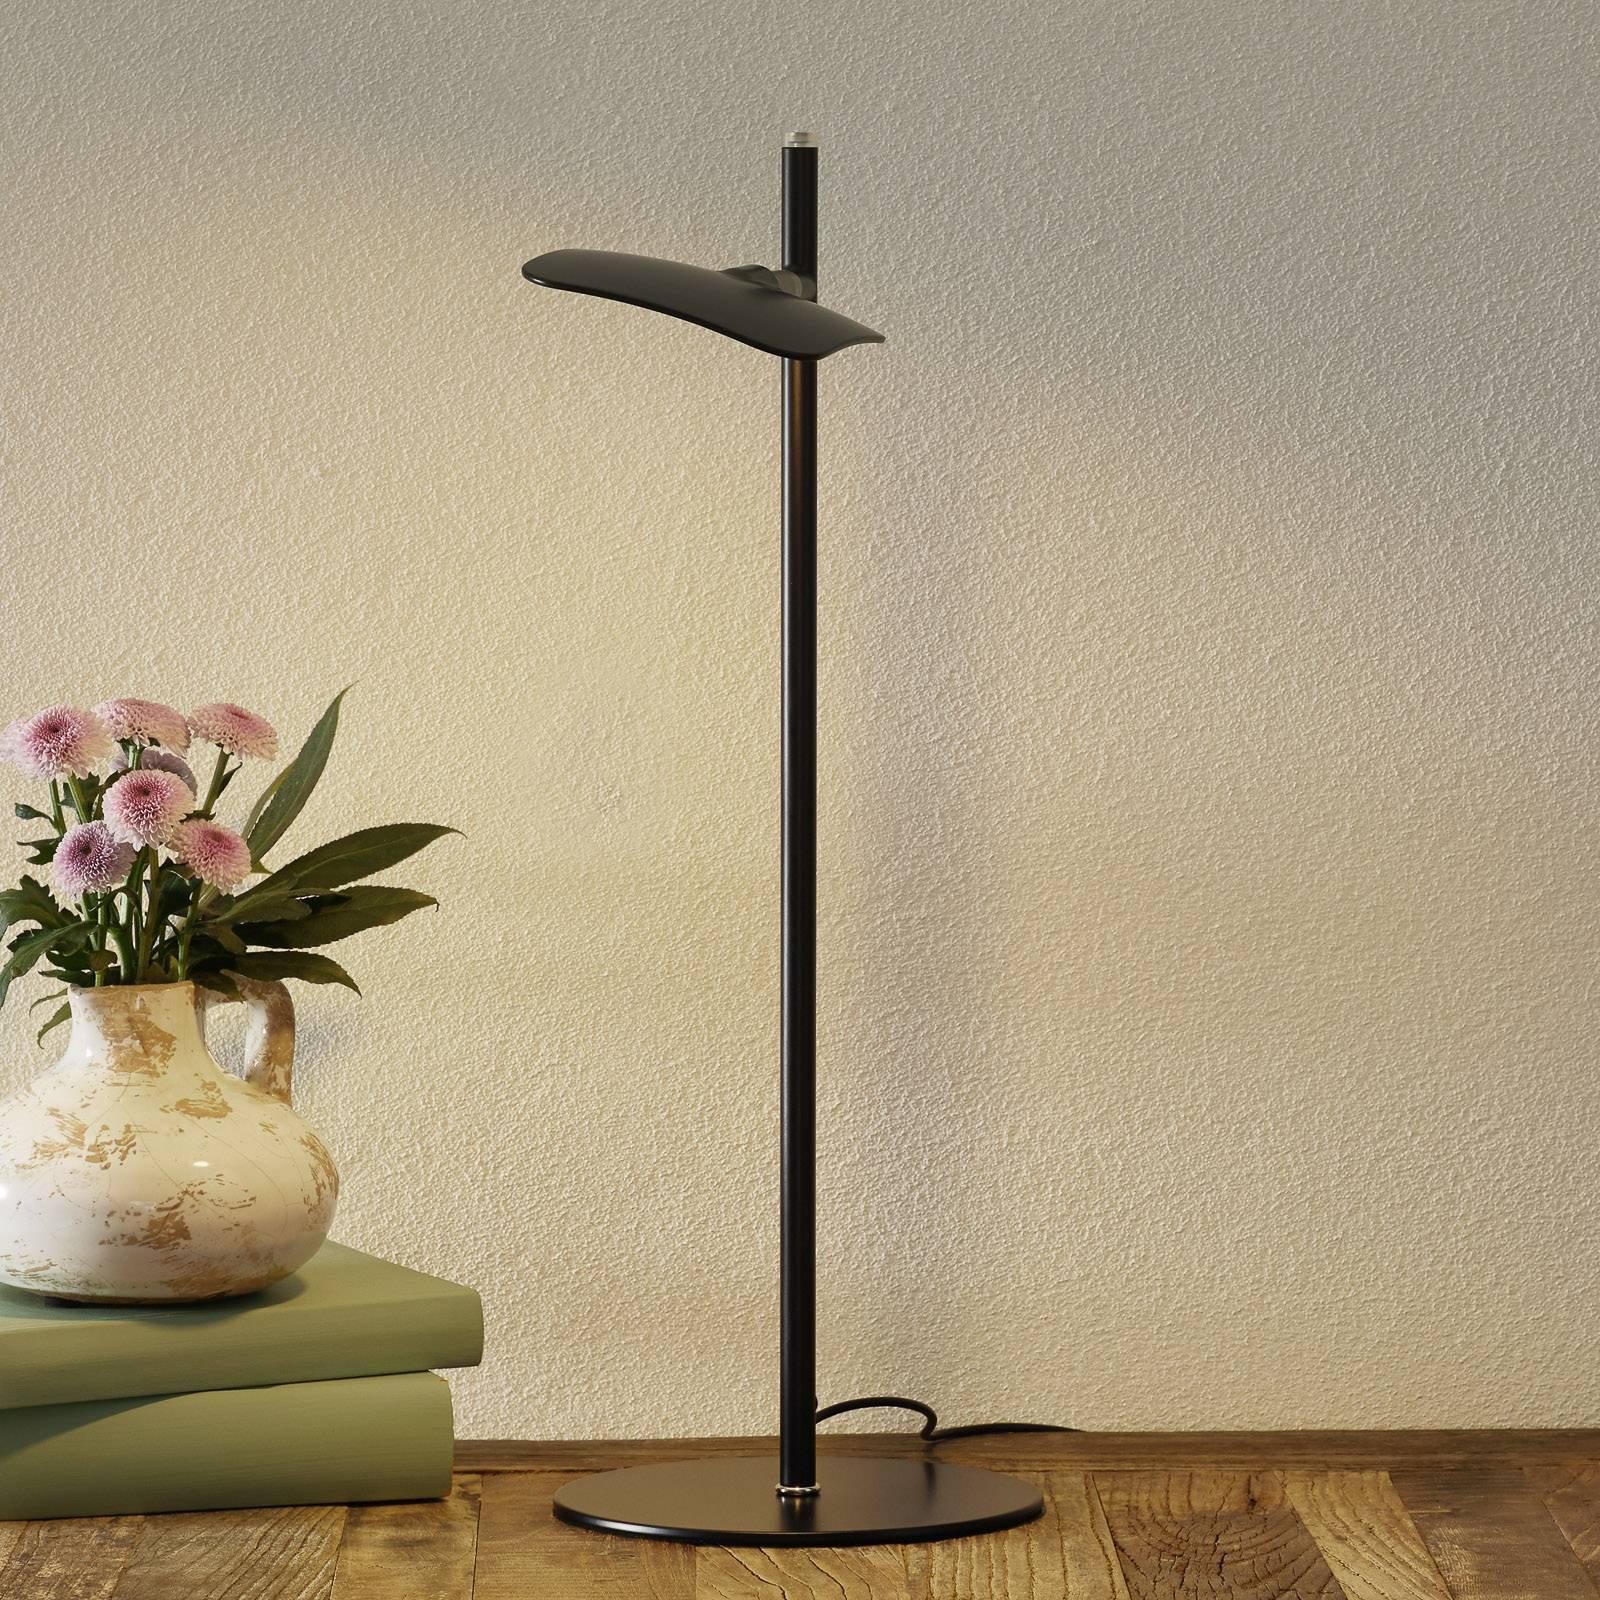 LED-bordlampe Raggio, dimbar, svart